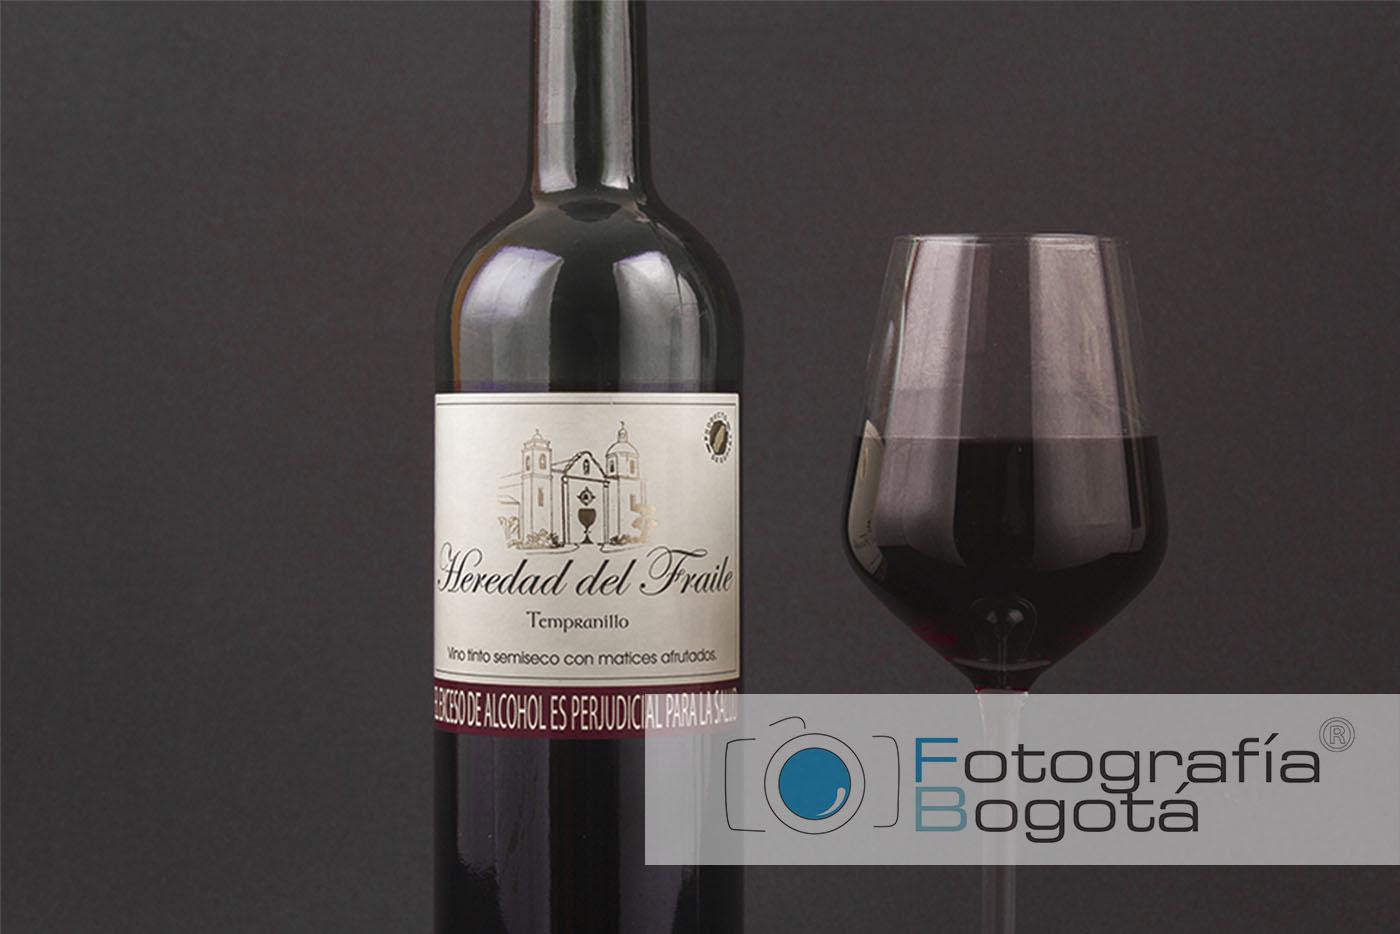 fotografia-bogota-catalogo-vino-tinto-colombia-oscuro